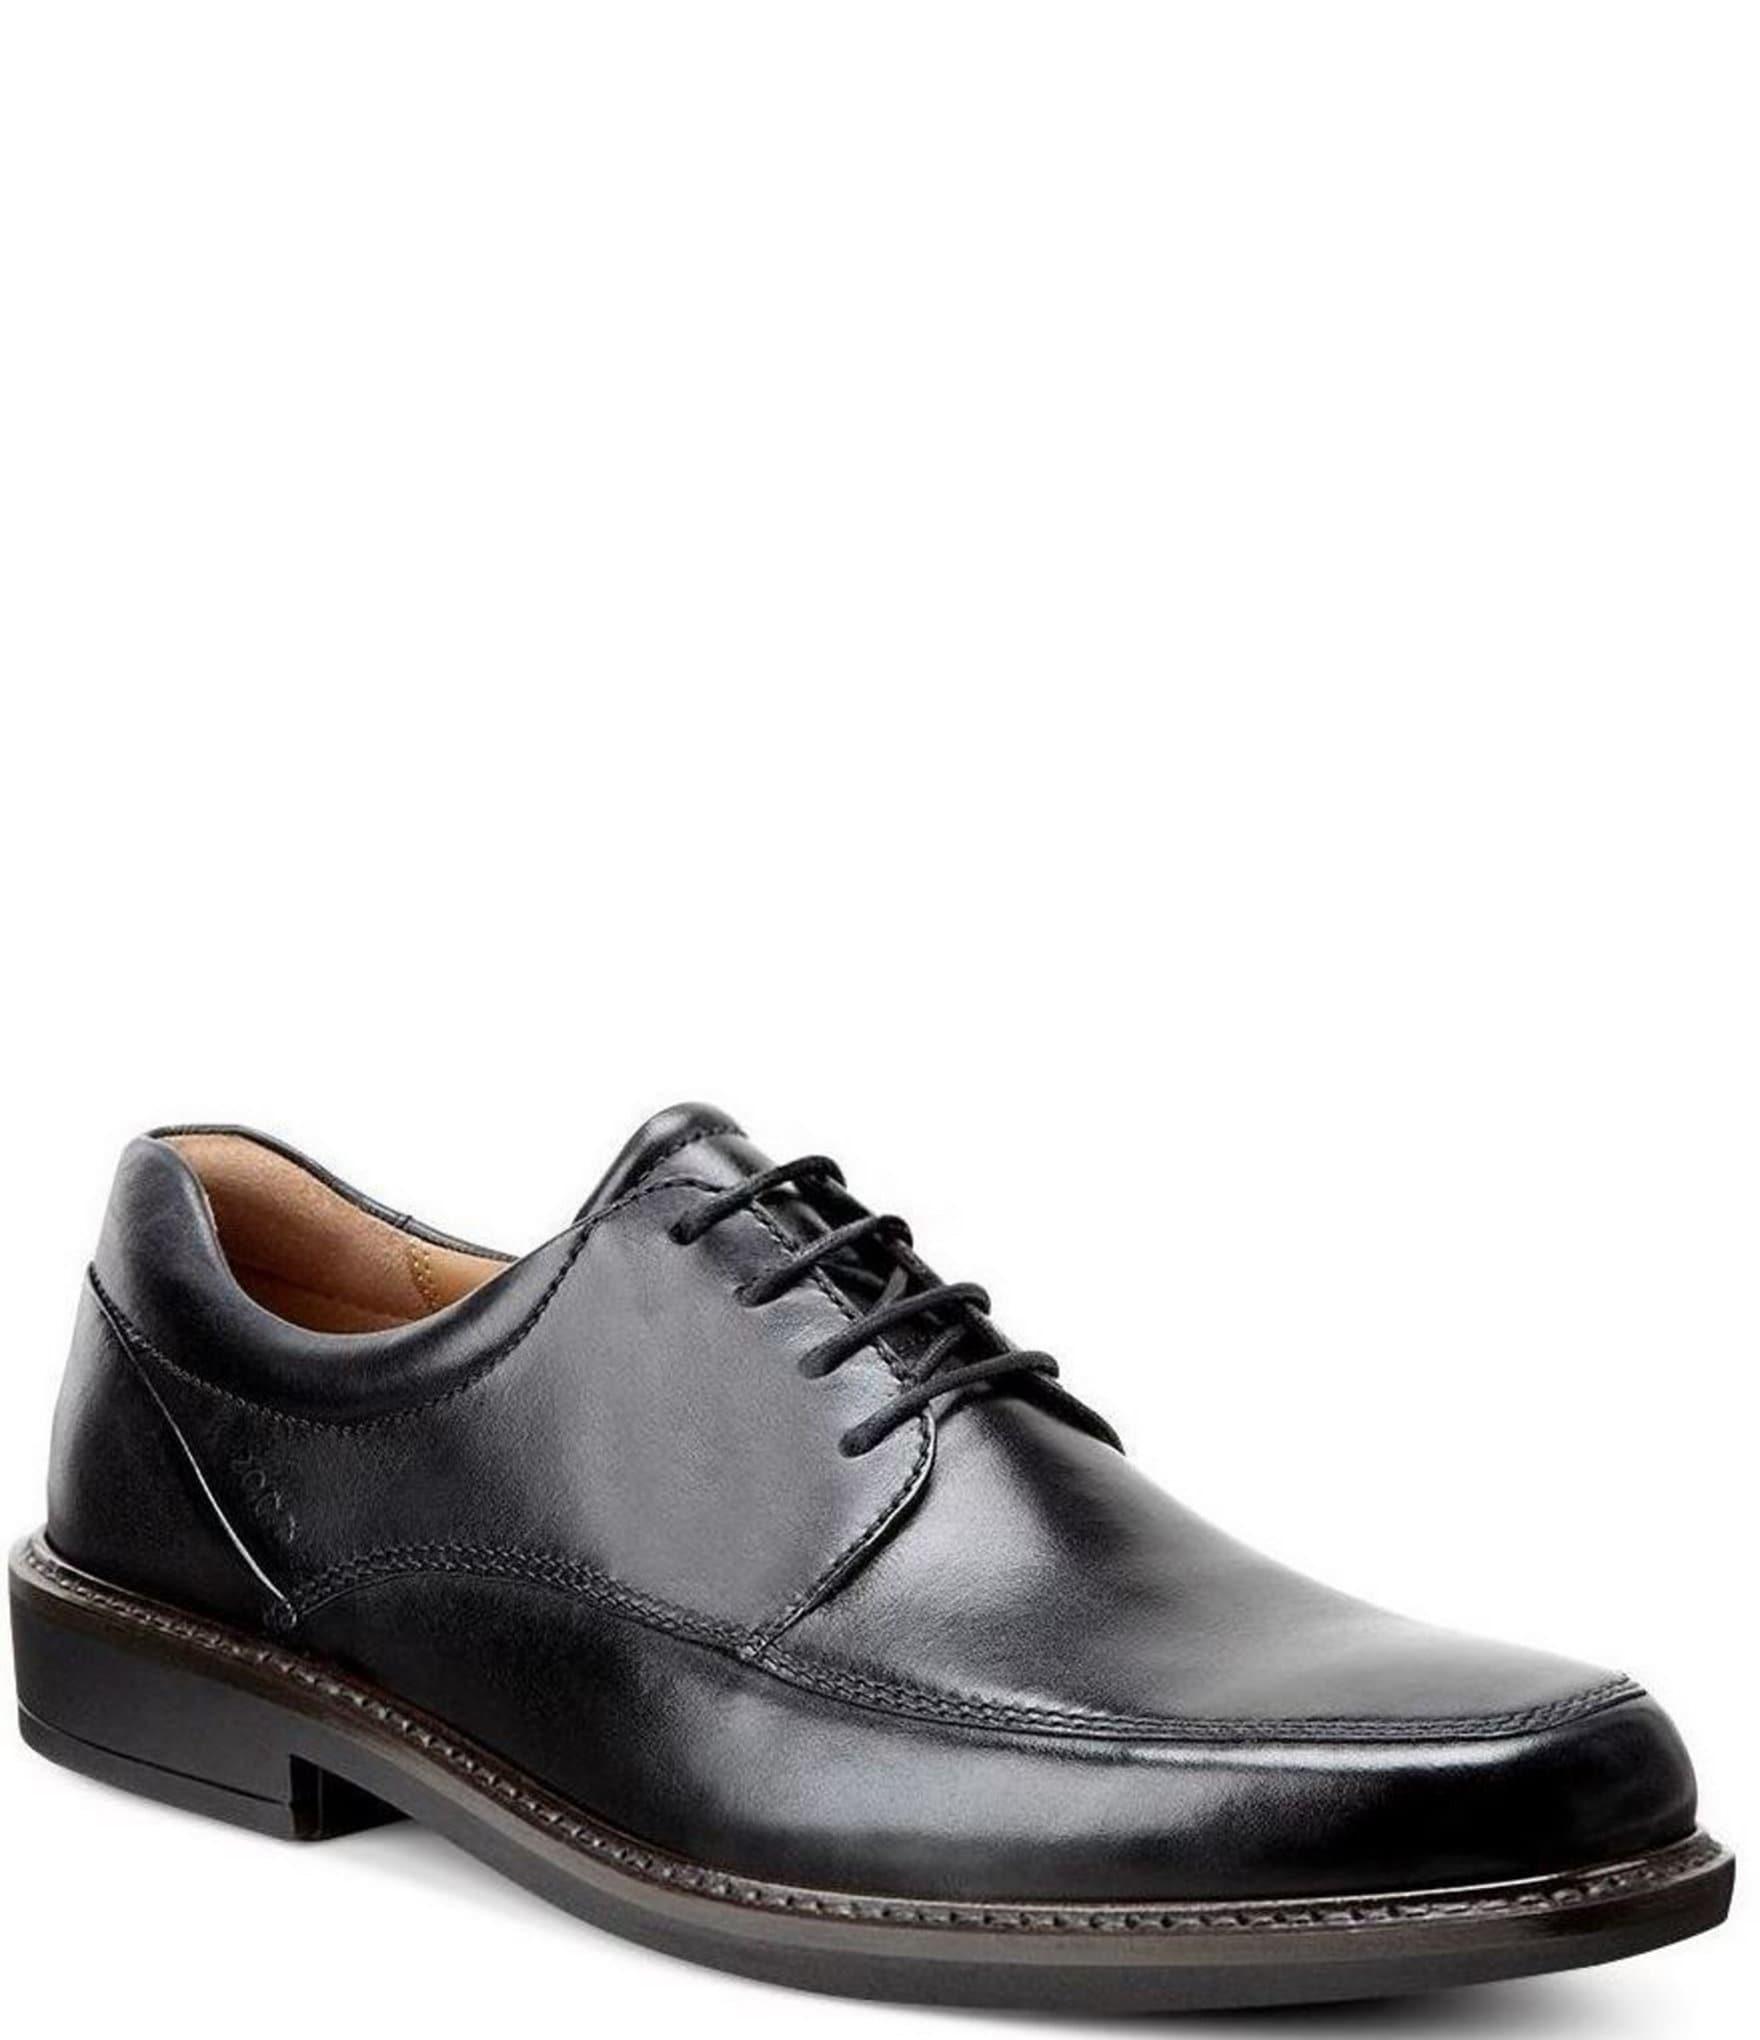 ECCO Men's Holton Apron Toe Dress Shoes | Dillard's